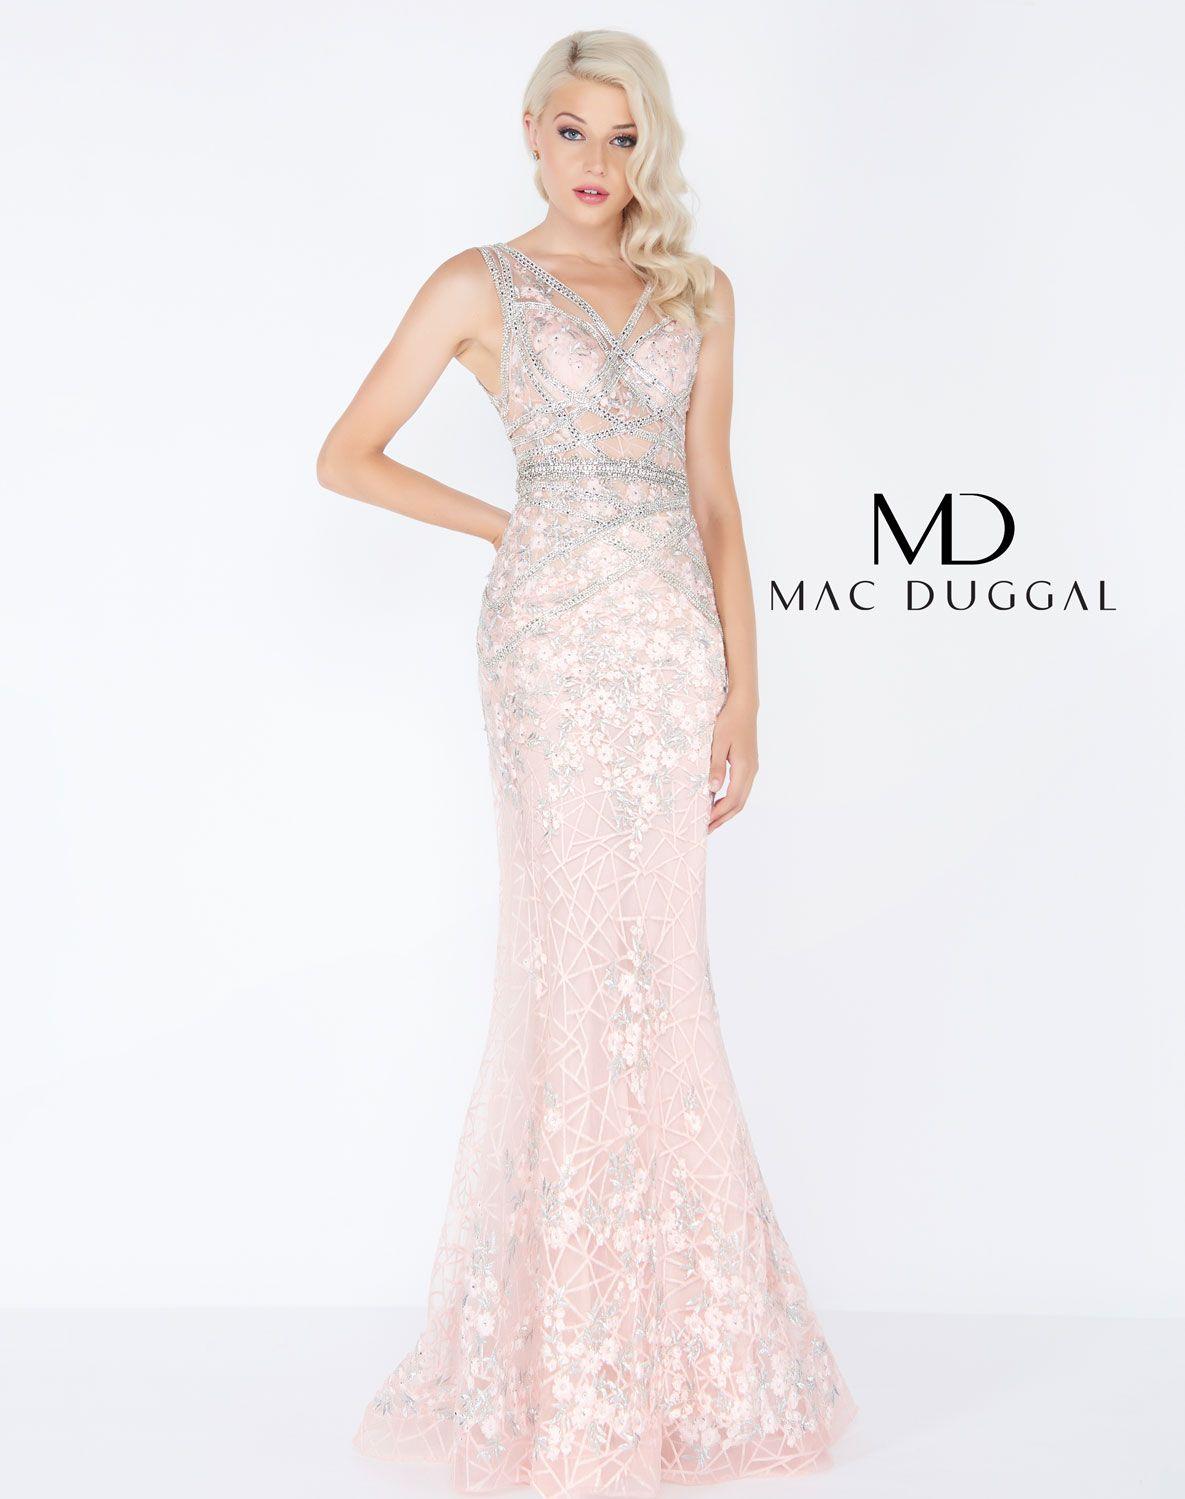 Mac duggal form fitting blush prom dress with crisscross